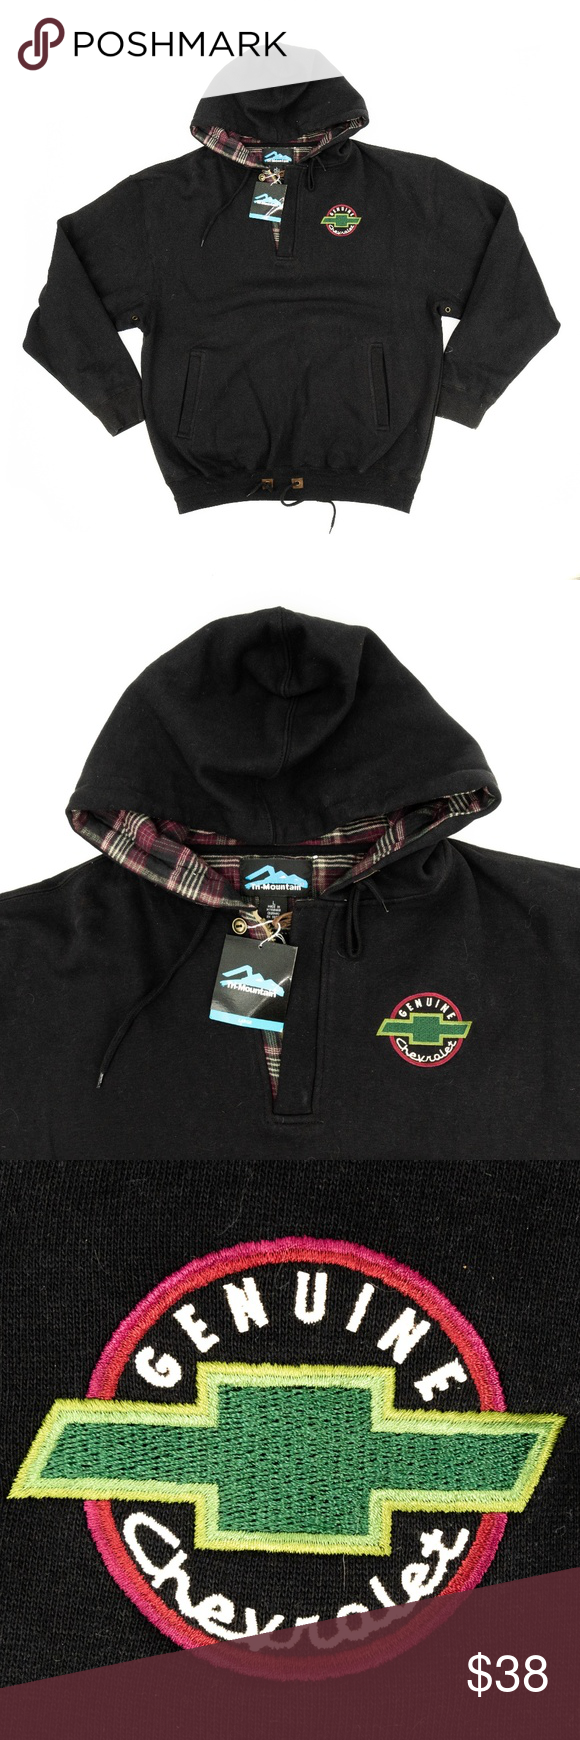 Tri Mountain Hooded Sweatshirt Chevrolet Chevy L Item Tri Mountain Men S Hooded Sweatshirt Genuine Chevro Hooded Sweatshirts Hooded Sweatshirt Men Sweatshirts [ 1740 x 580 Pixel ]